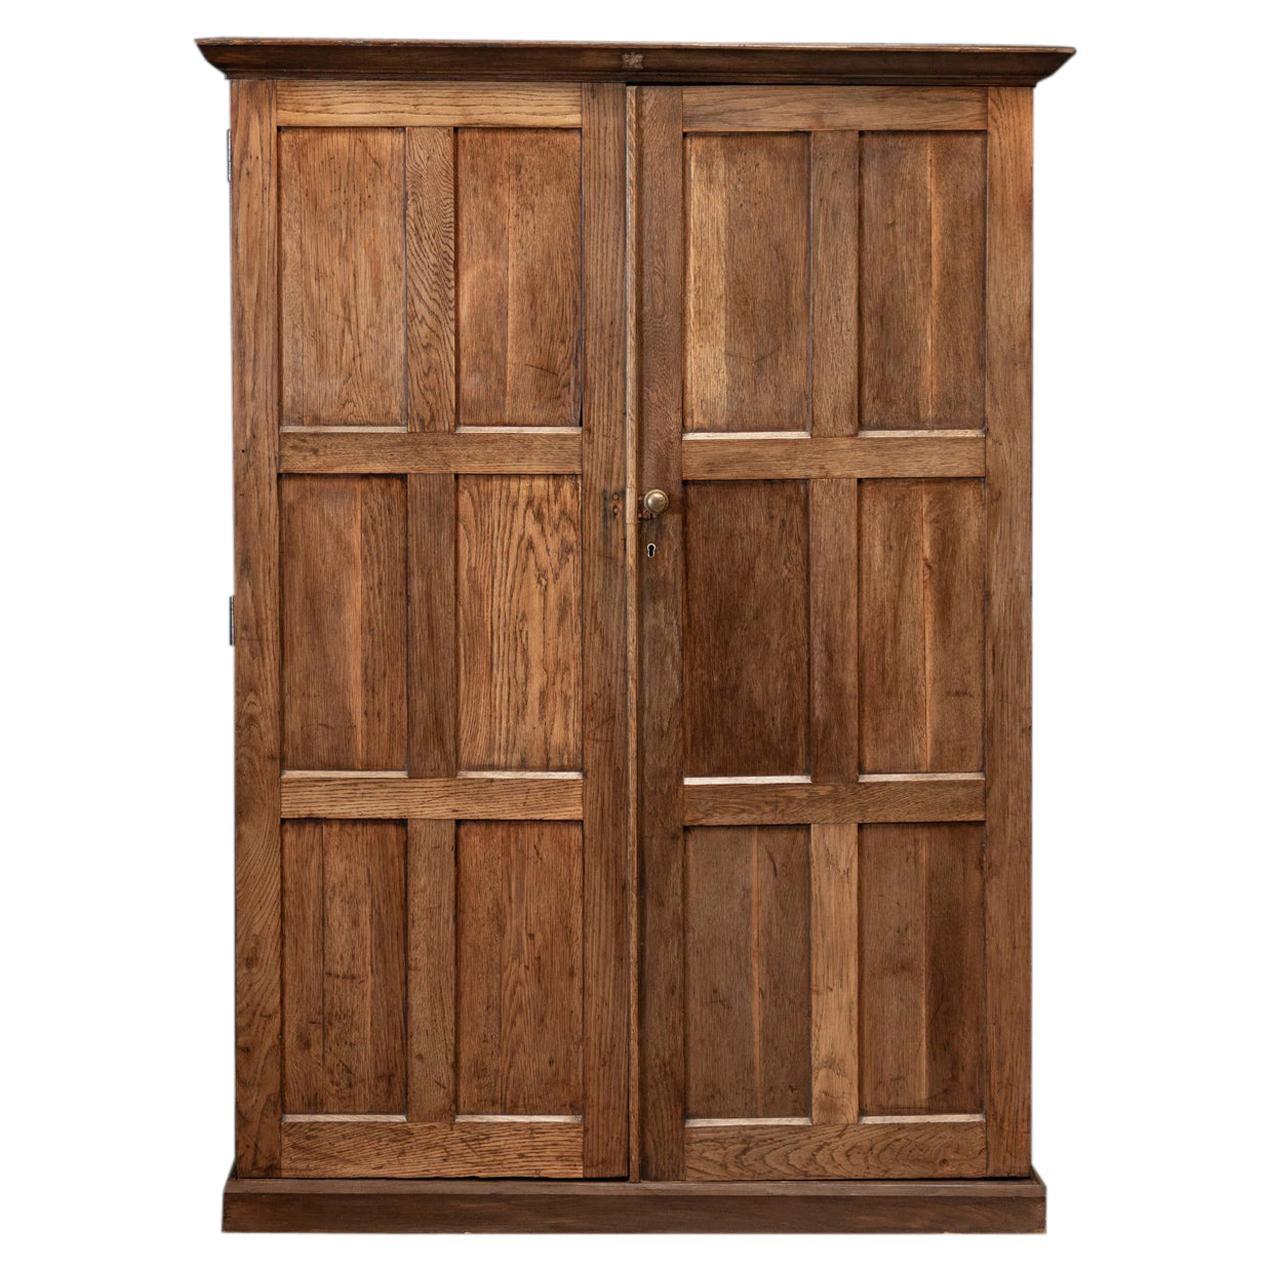 19thC English Oak Panelled Cupboard